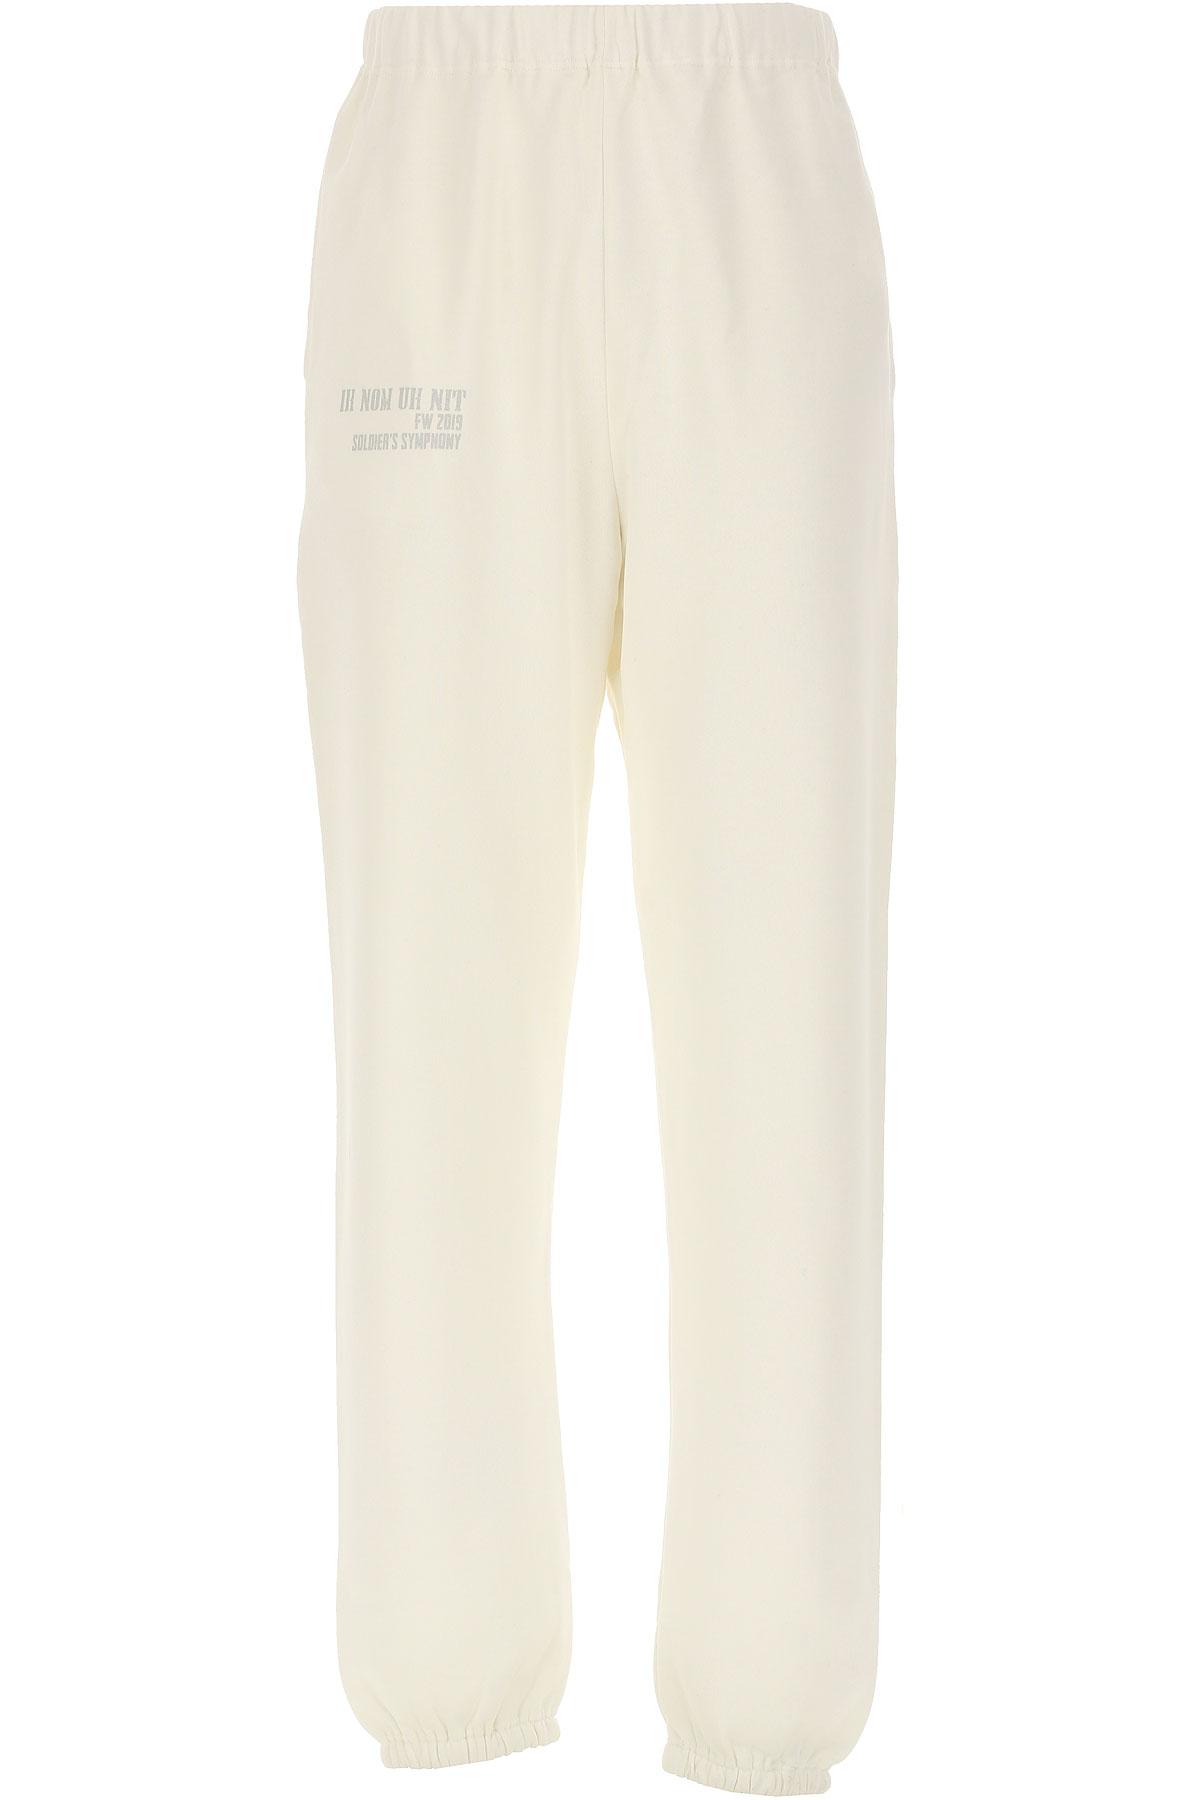 Ih Nom Uh Nit Sweatpants On Sale, White, Cotton, 2019, L (EU 50) XS M (EU 48) S (EU 46)